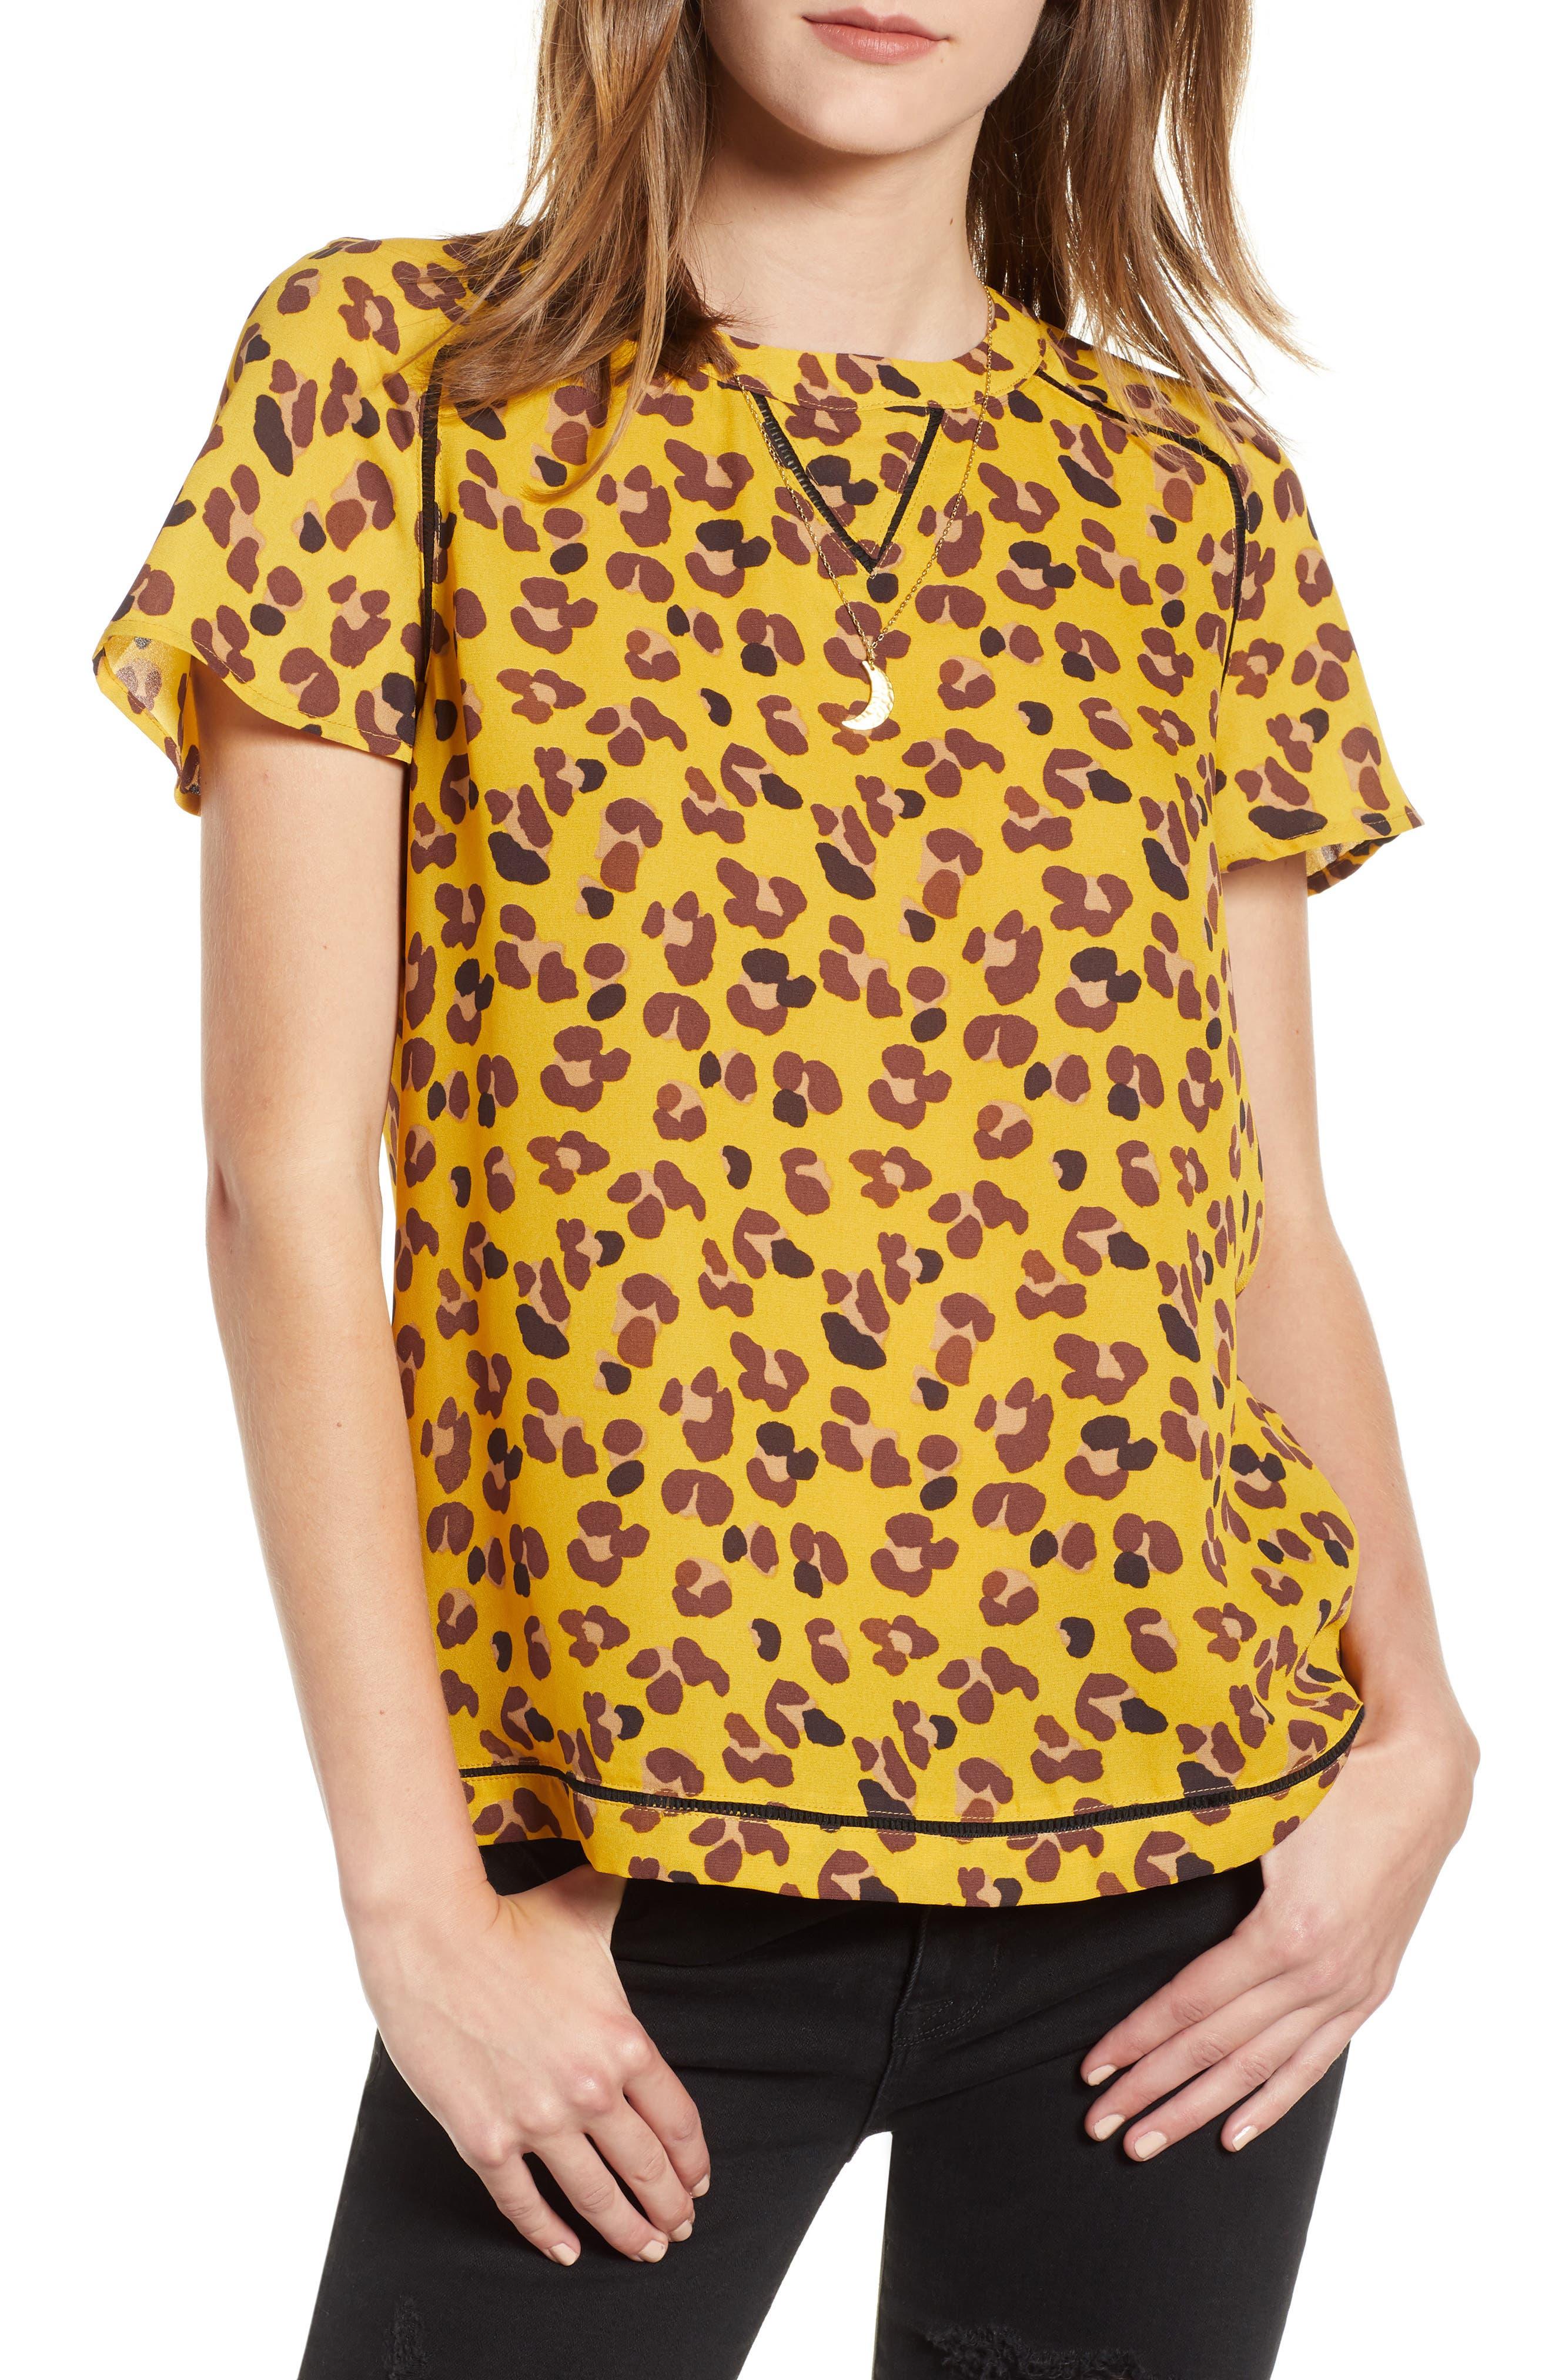 Leopard Print Top,                         Main,                         color, YELLOW LEOPARD PRINT